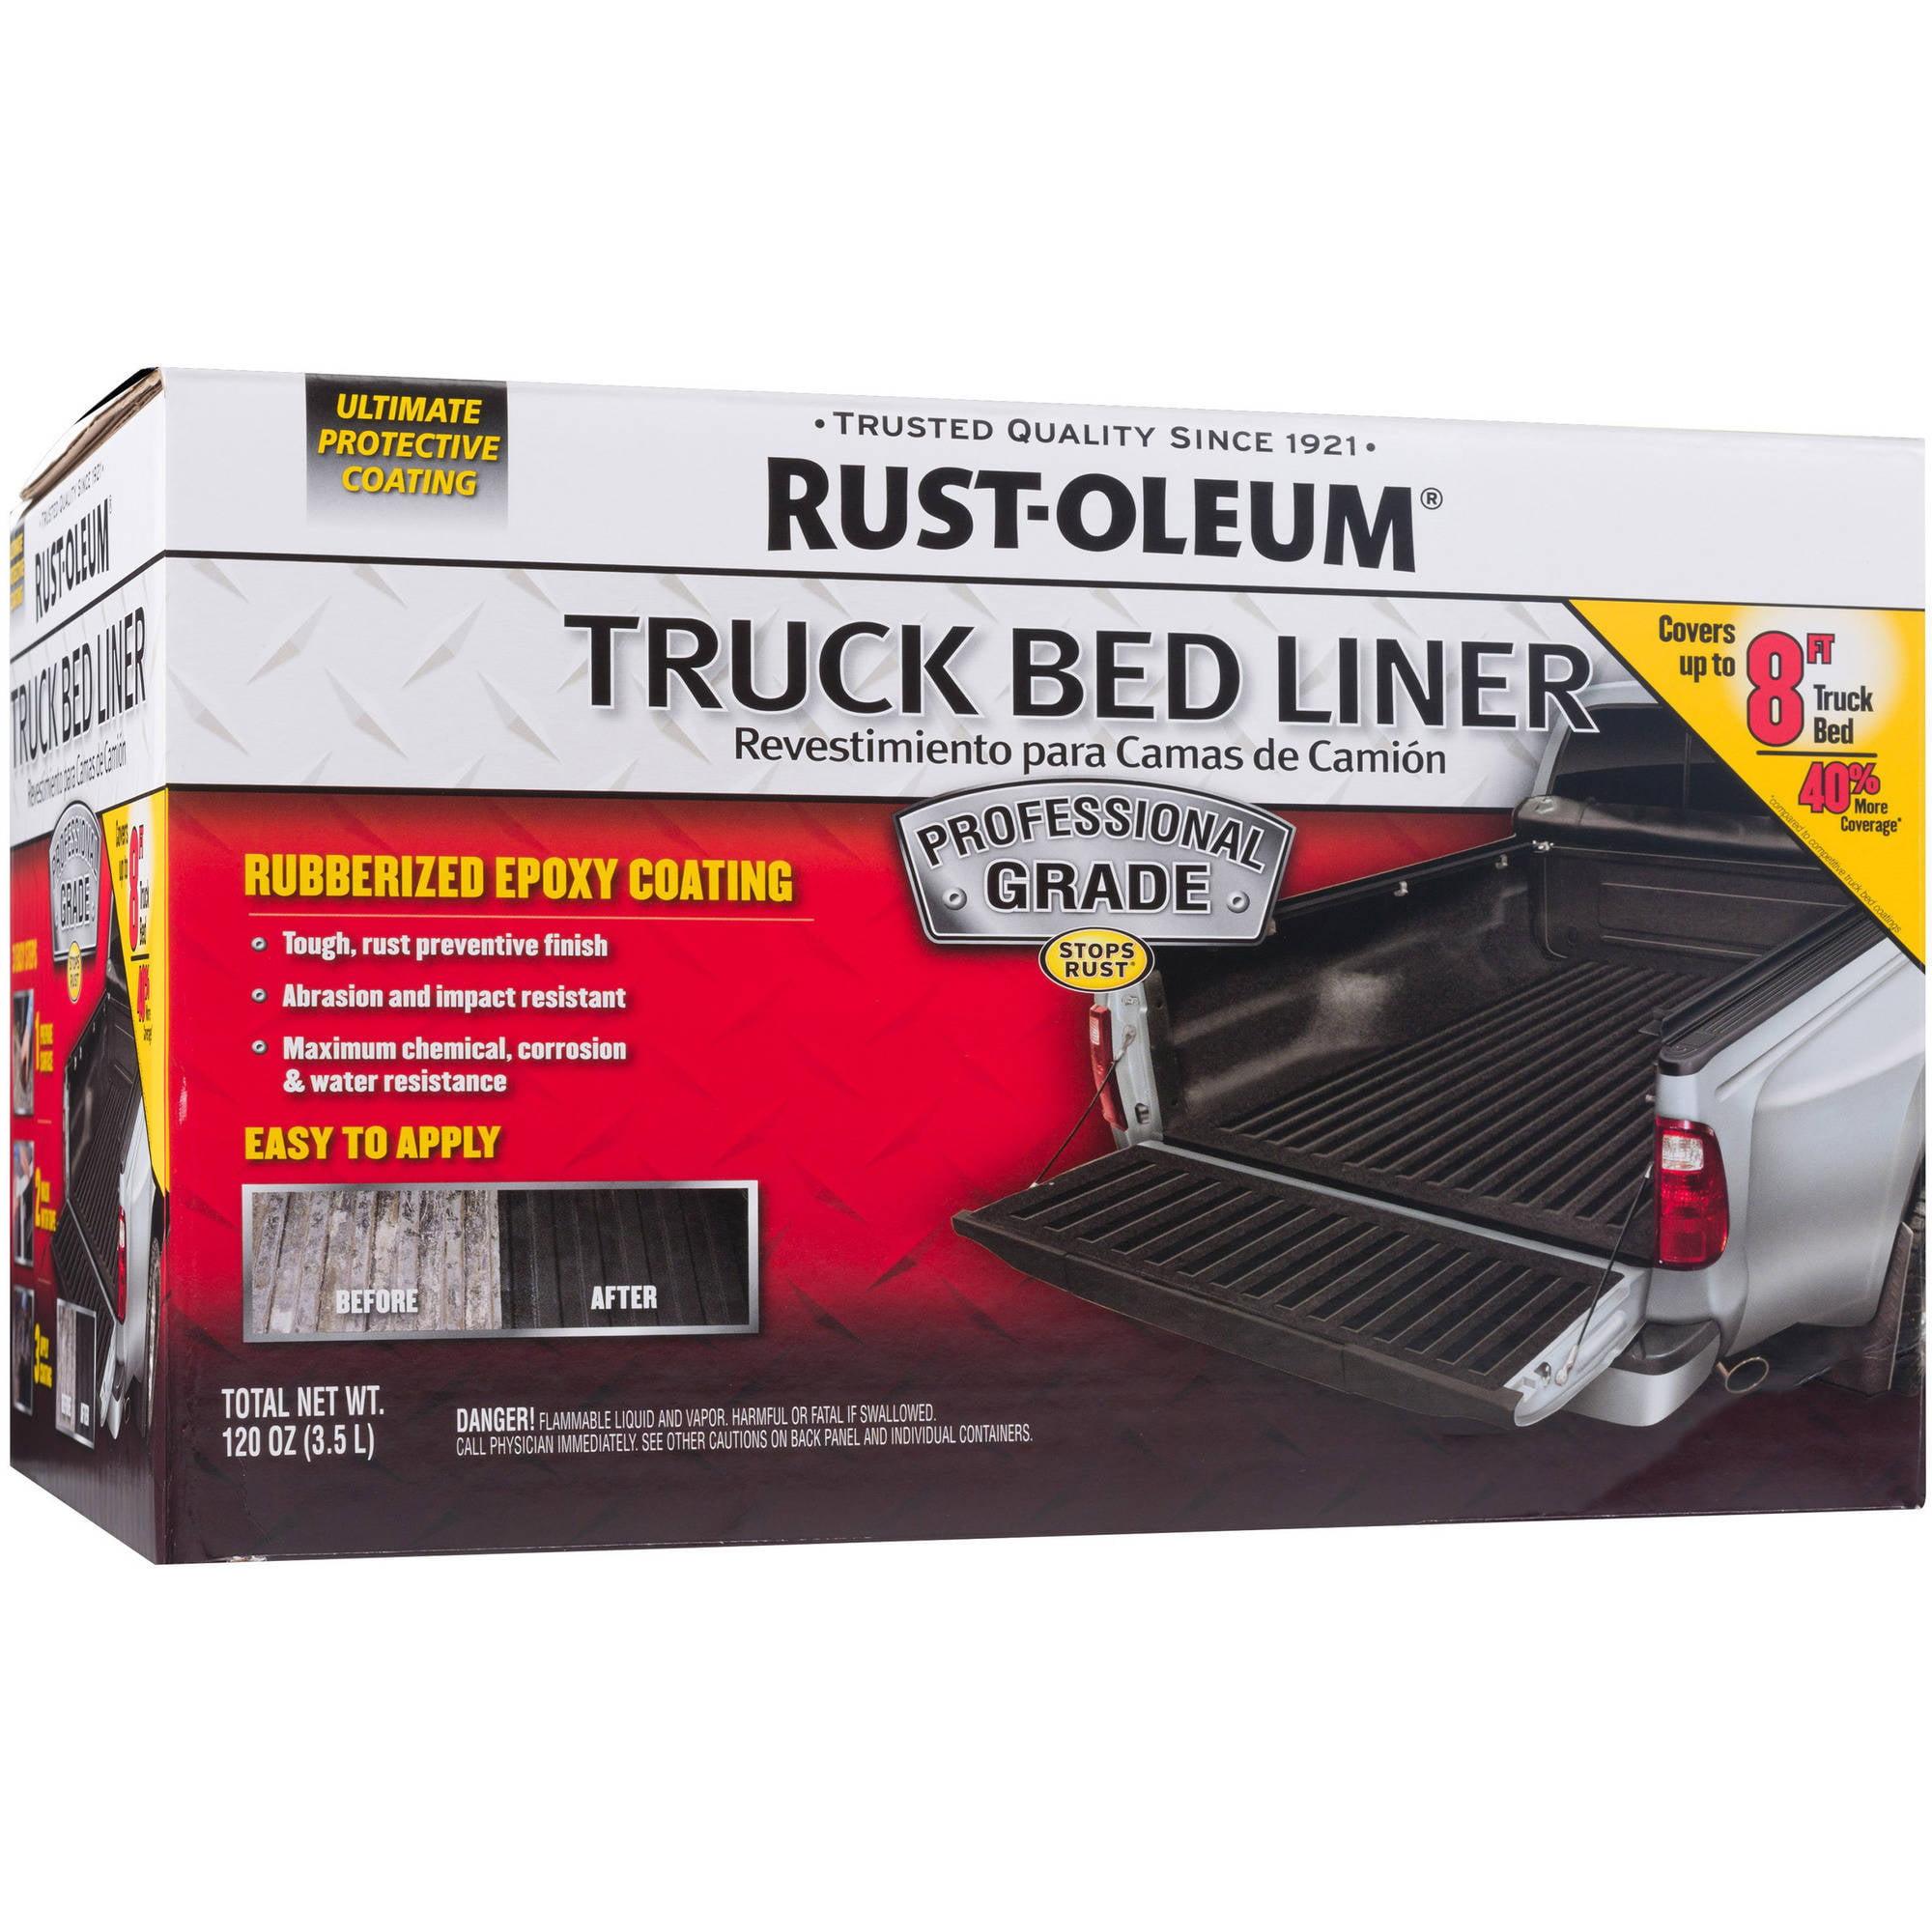 Rust-Oleum Professional Grade Truck Bed Liner Kit